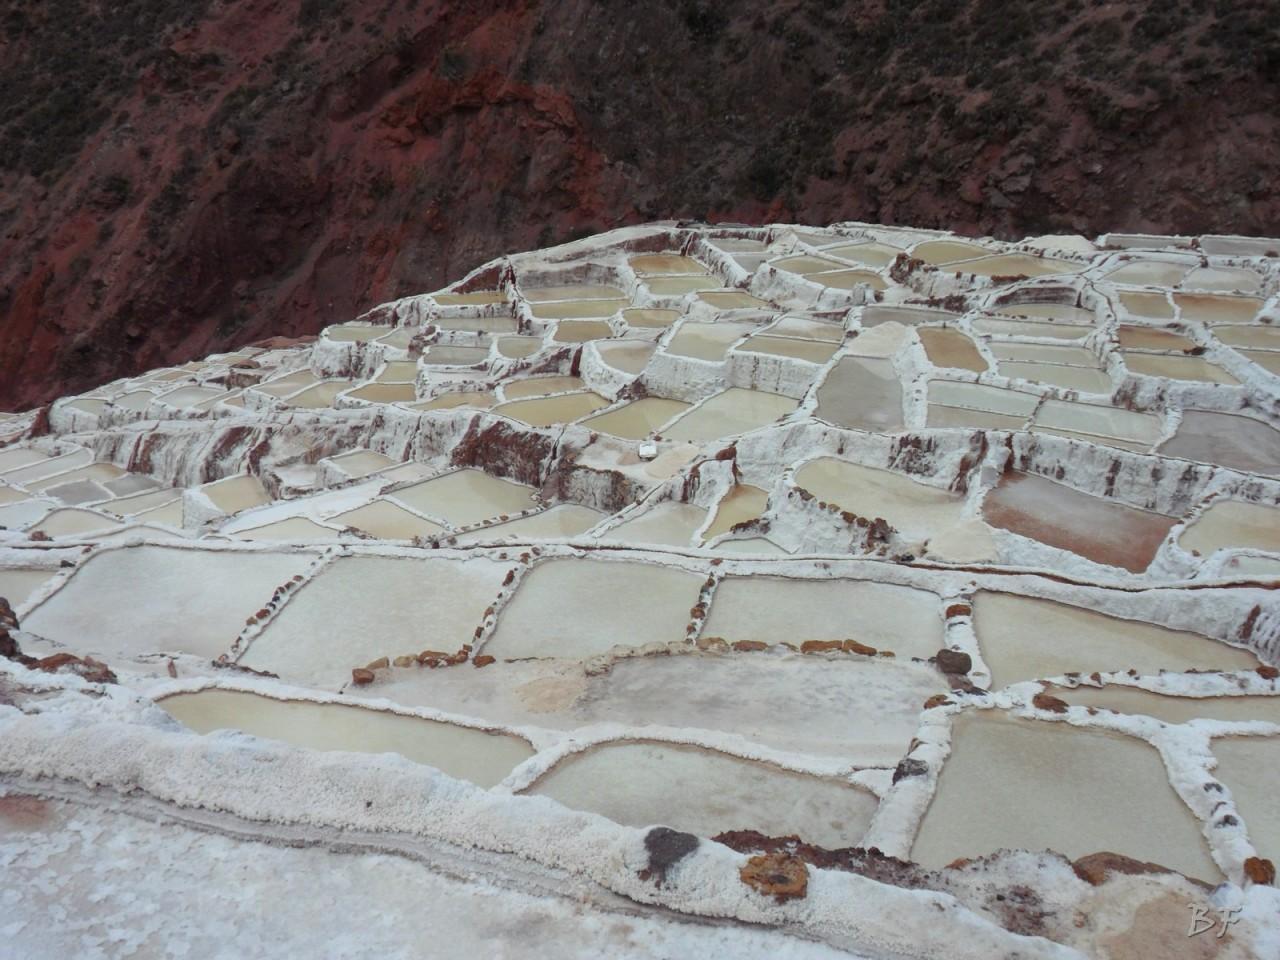 Terrazze-Circolari-Megaliti-Moray-Saline-Maras-Cusco-Perù-9